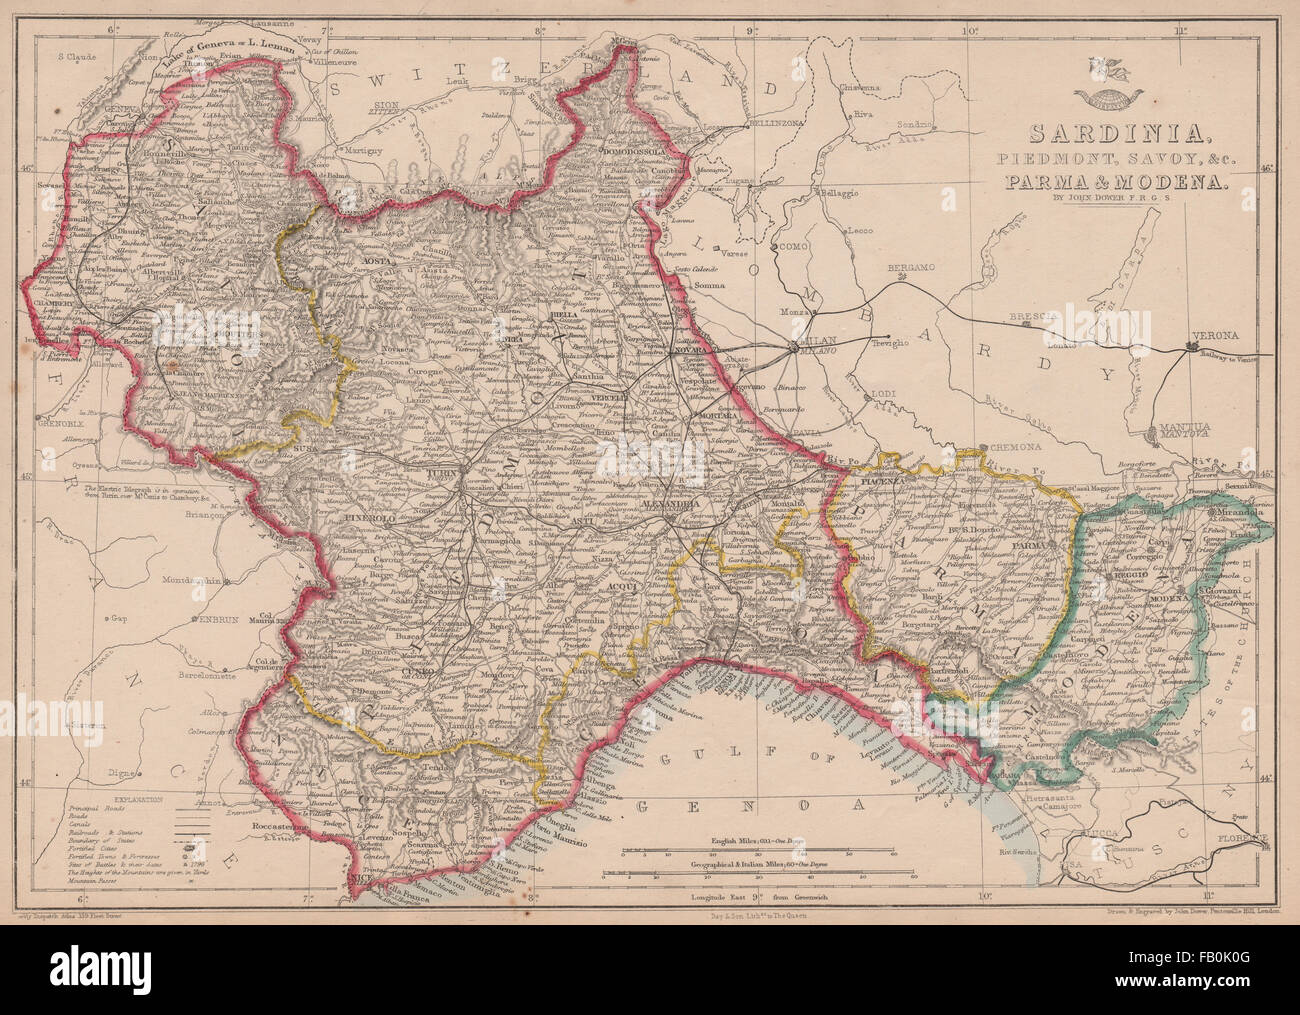 Cartina Del Regno Di Sardegna.Sardegna Piemonte Immagini Sardegna Piemonte Fotos Stock Alamy